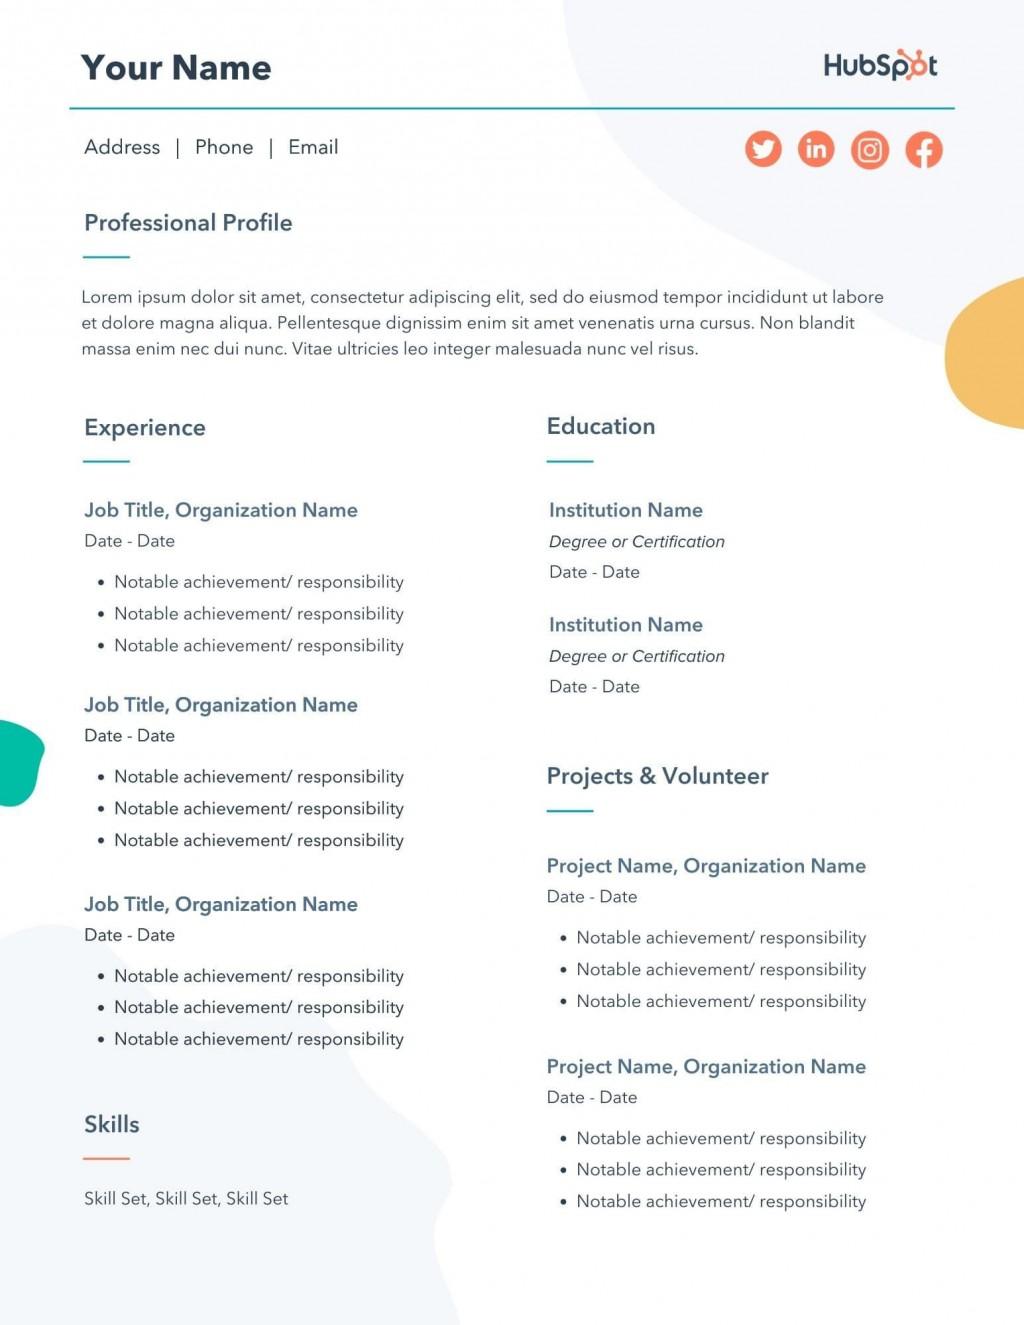 008 Impressive How To Create A Resume Template In Microsoft Word Idea  Cv/resume DocxLarge